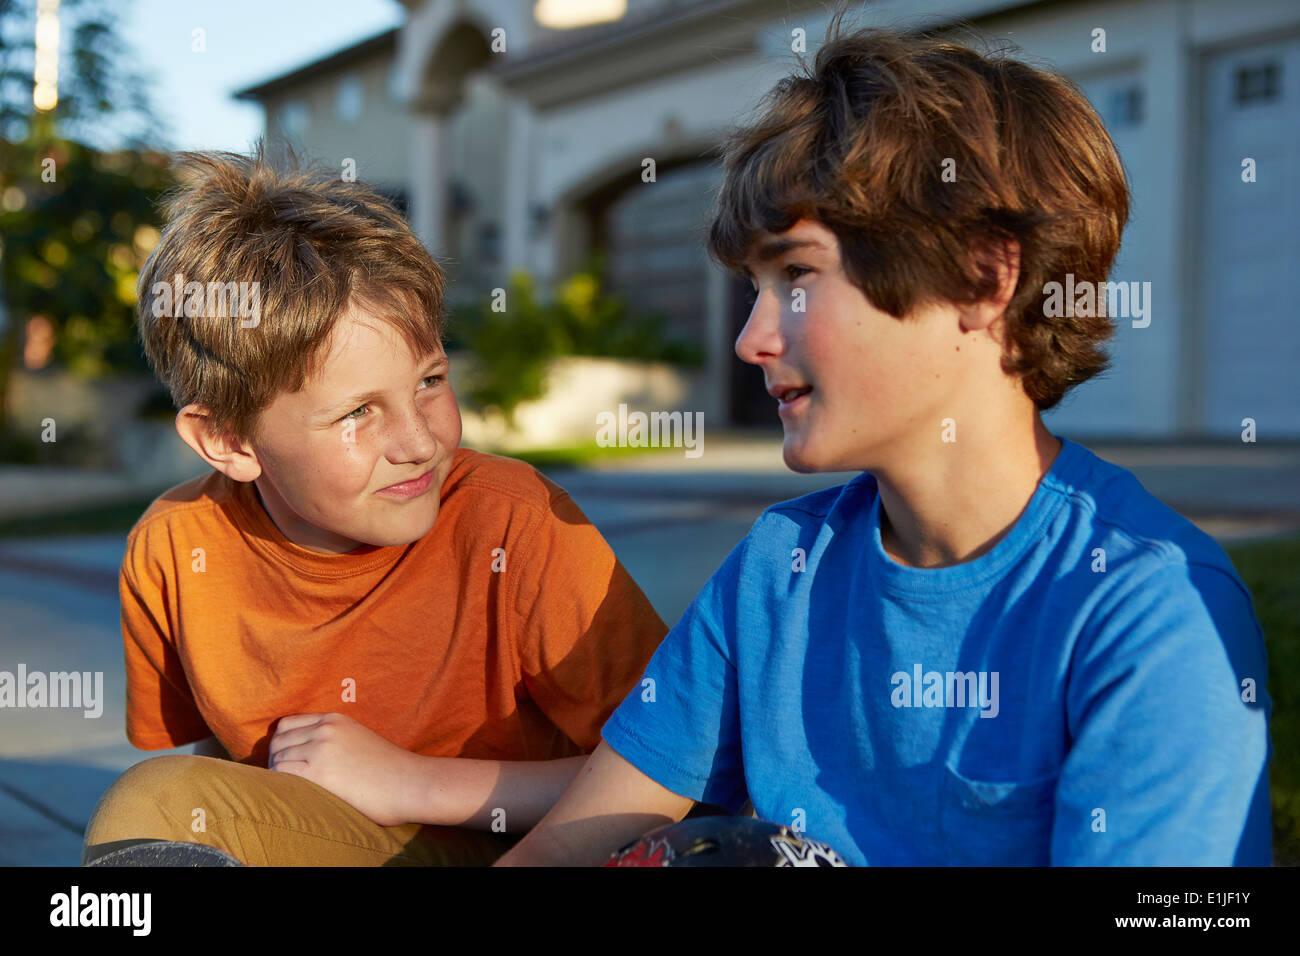 Two boys talking - Stock Image